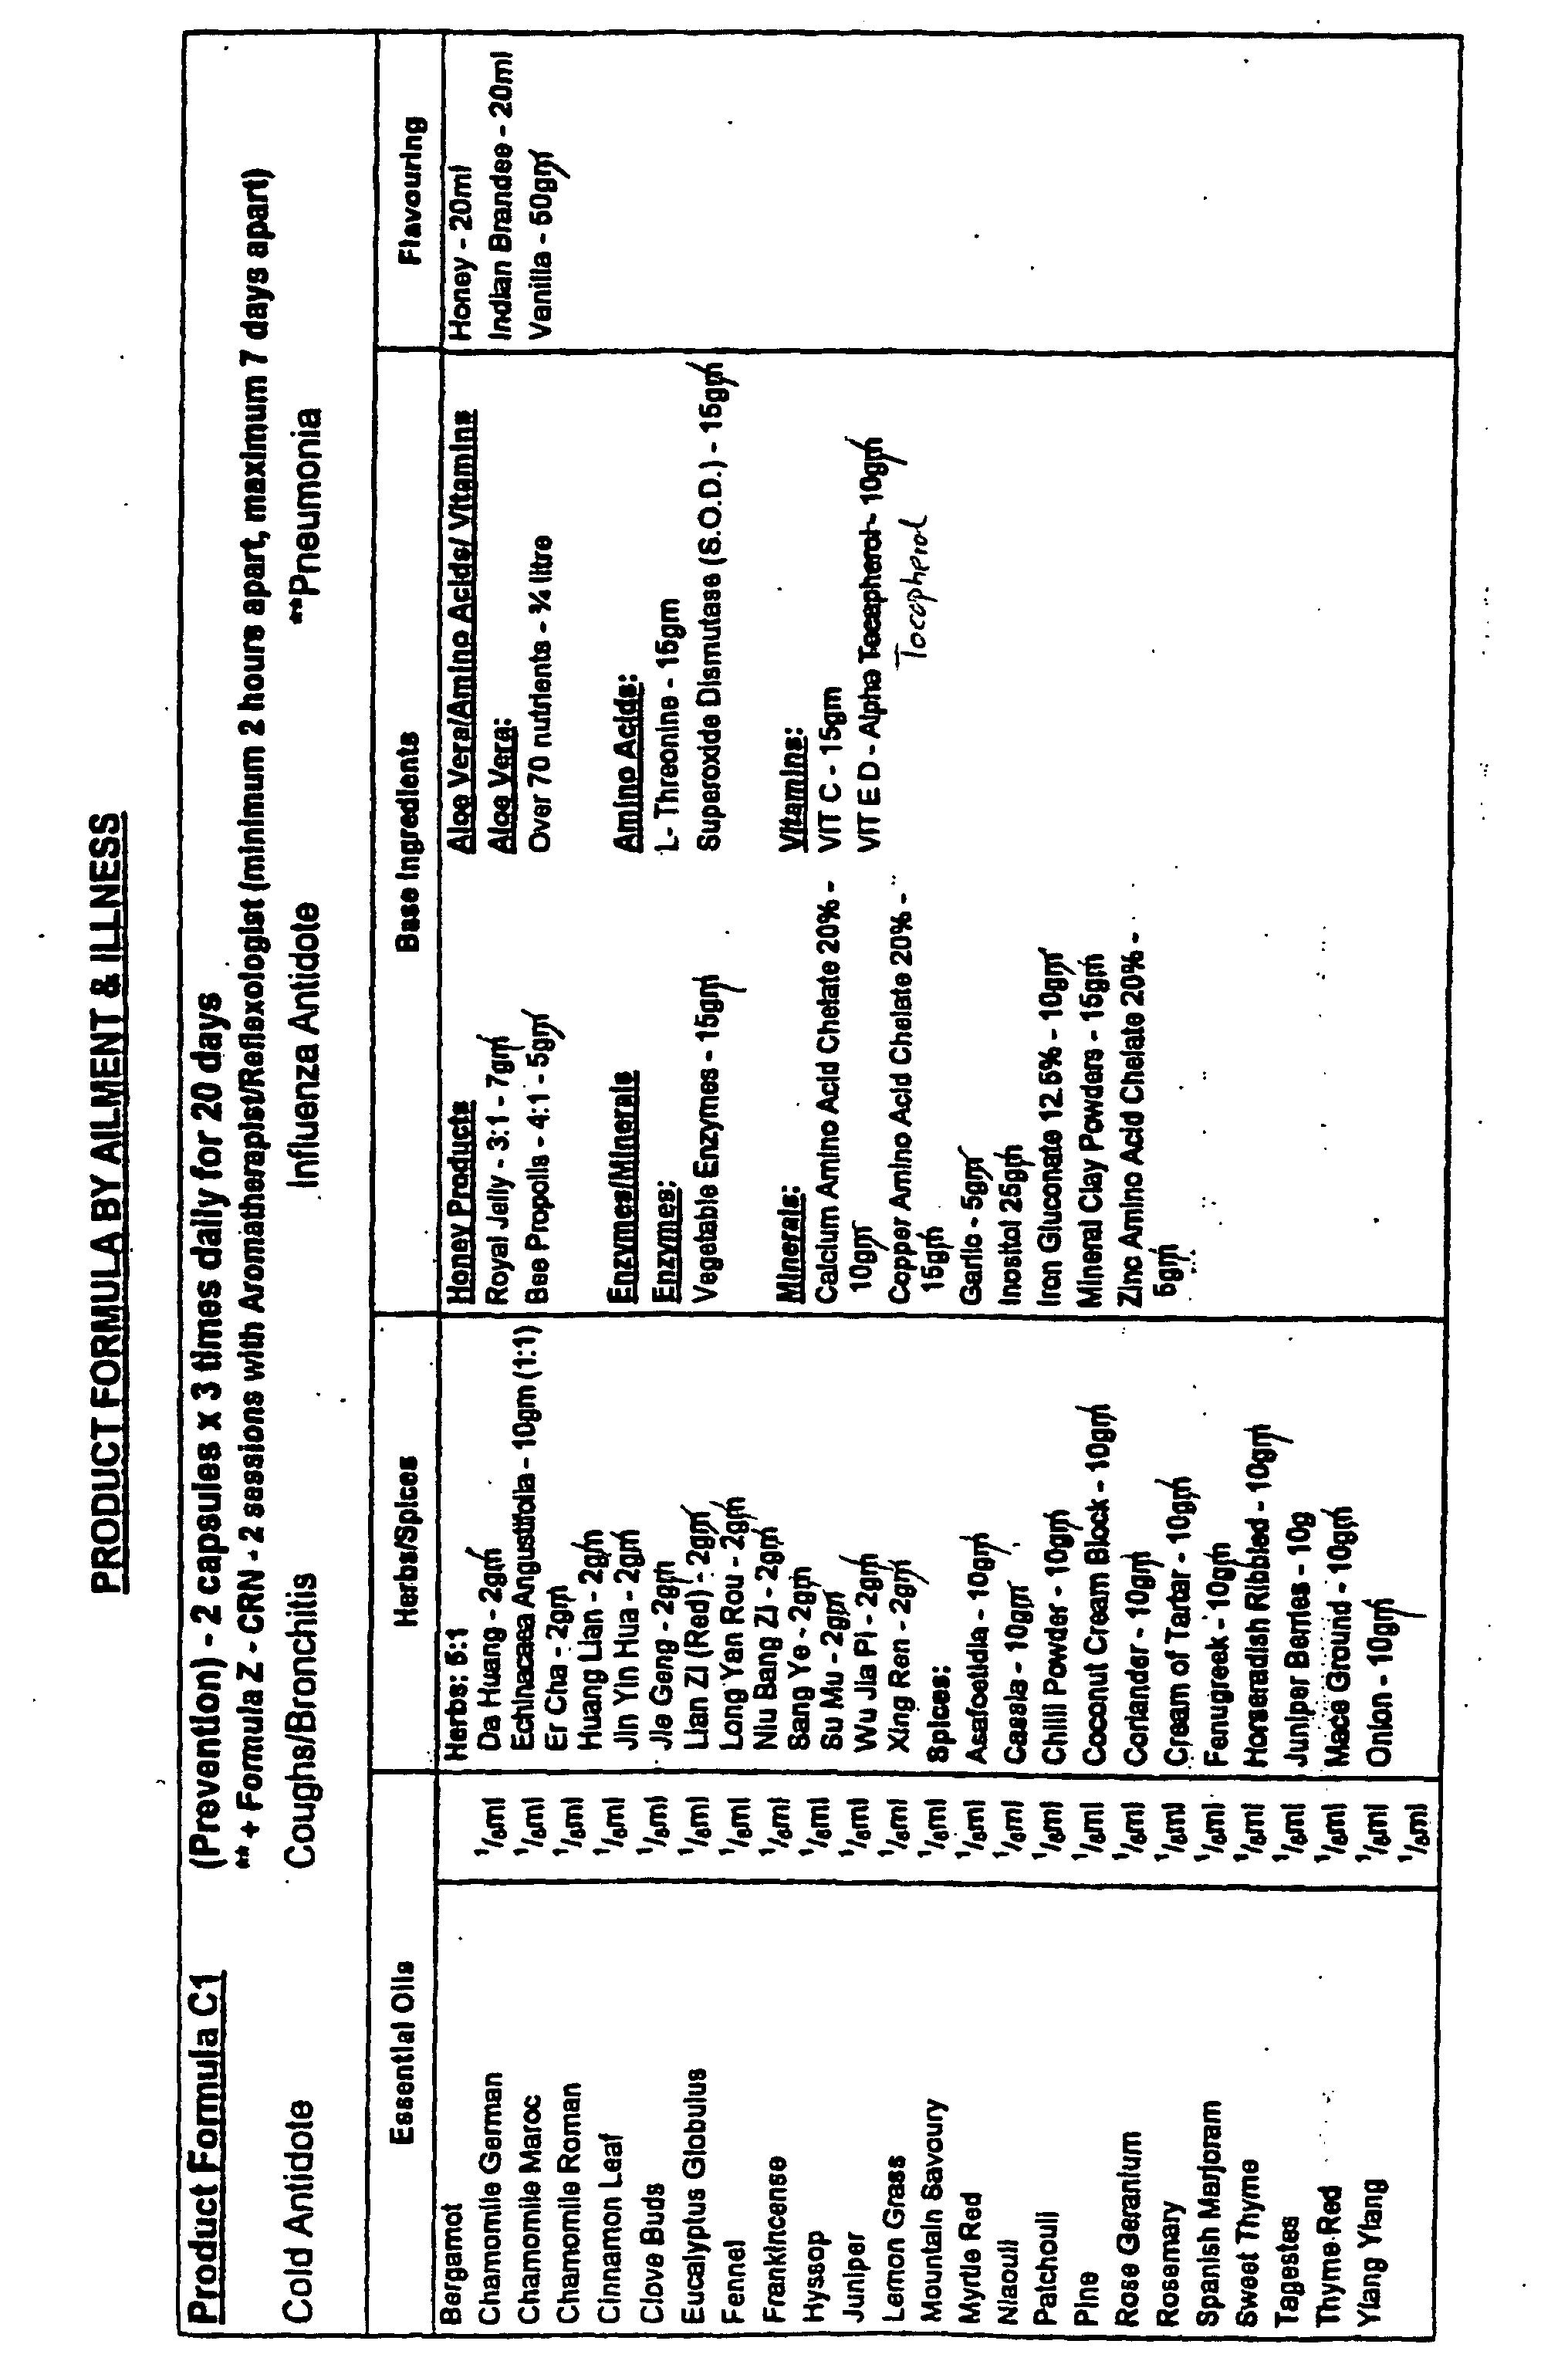 EP0973529B1 - Essential oil composition - Google Patents